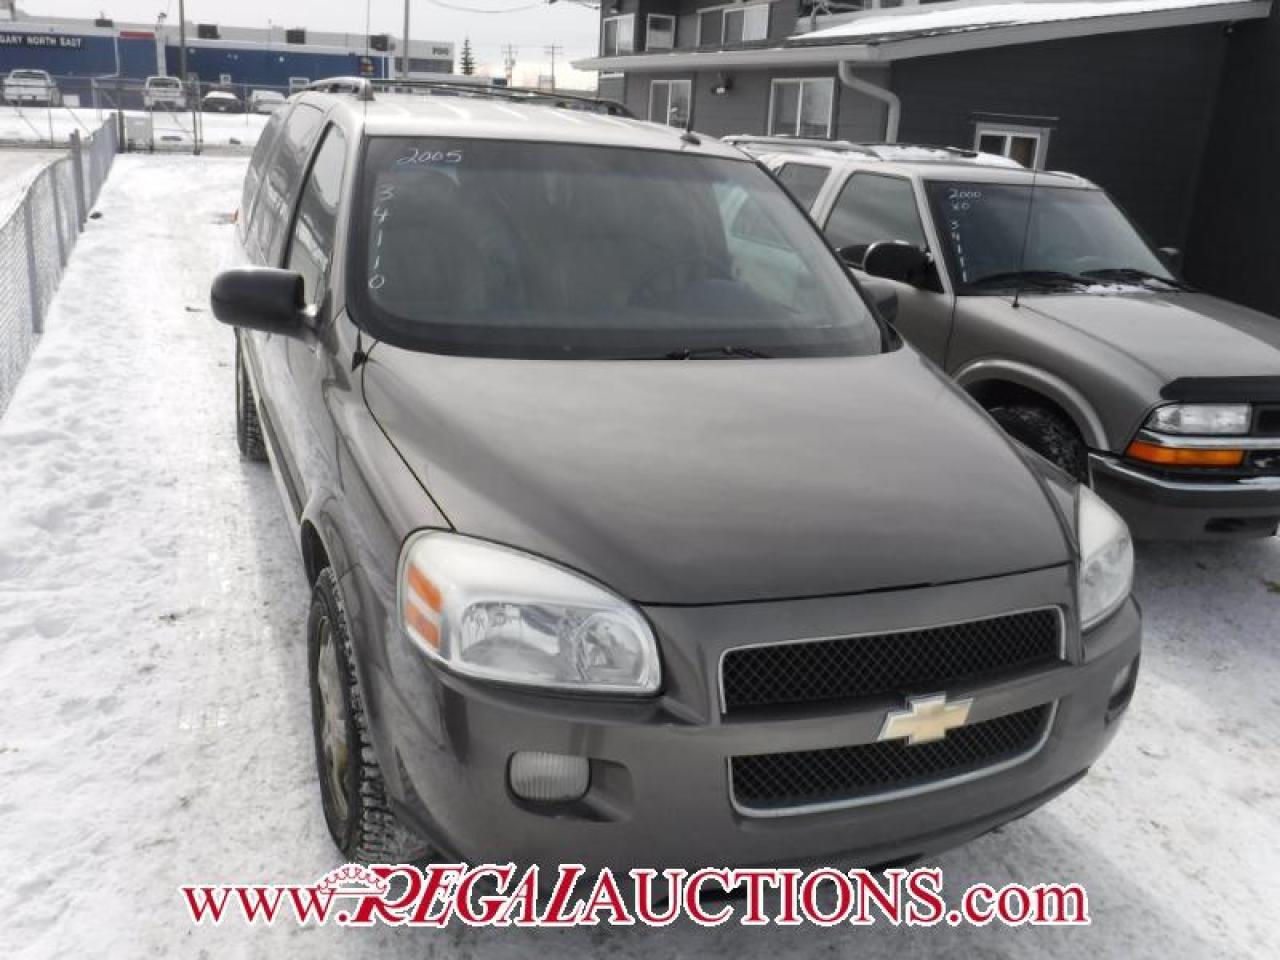 Photo of Bronze 2005 Chevrolet UPLANDER, 4D LS 4D EXT WAGON